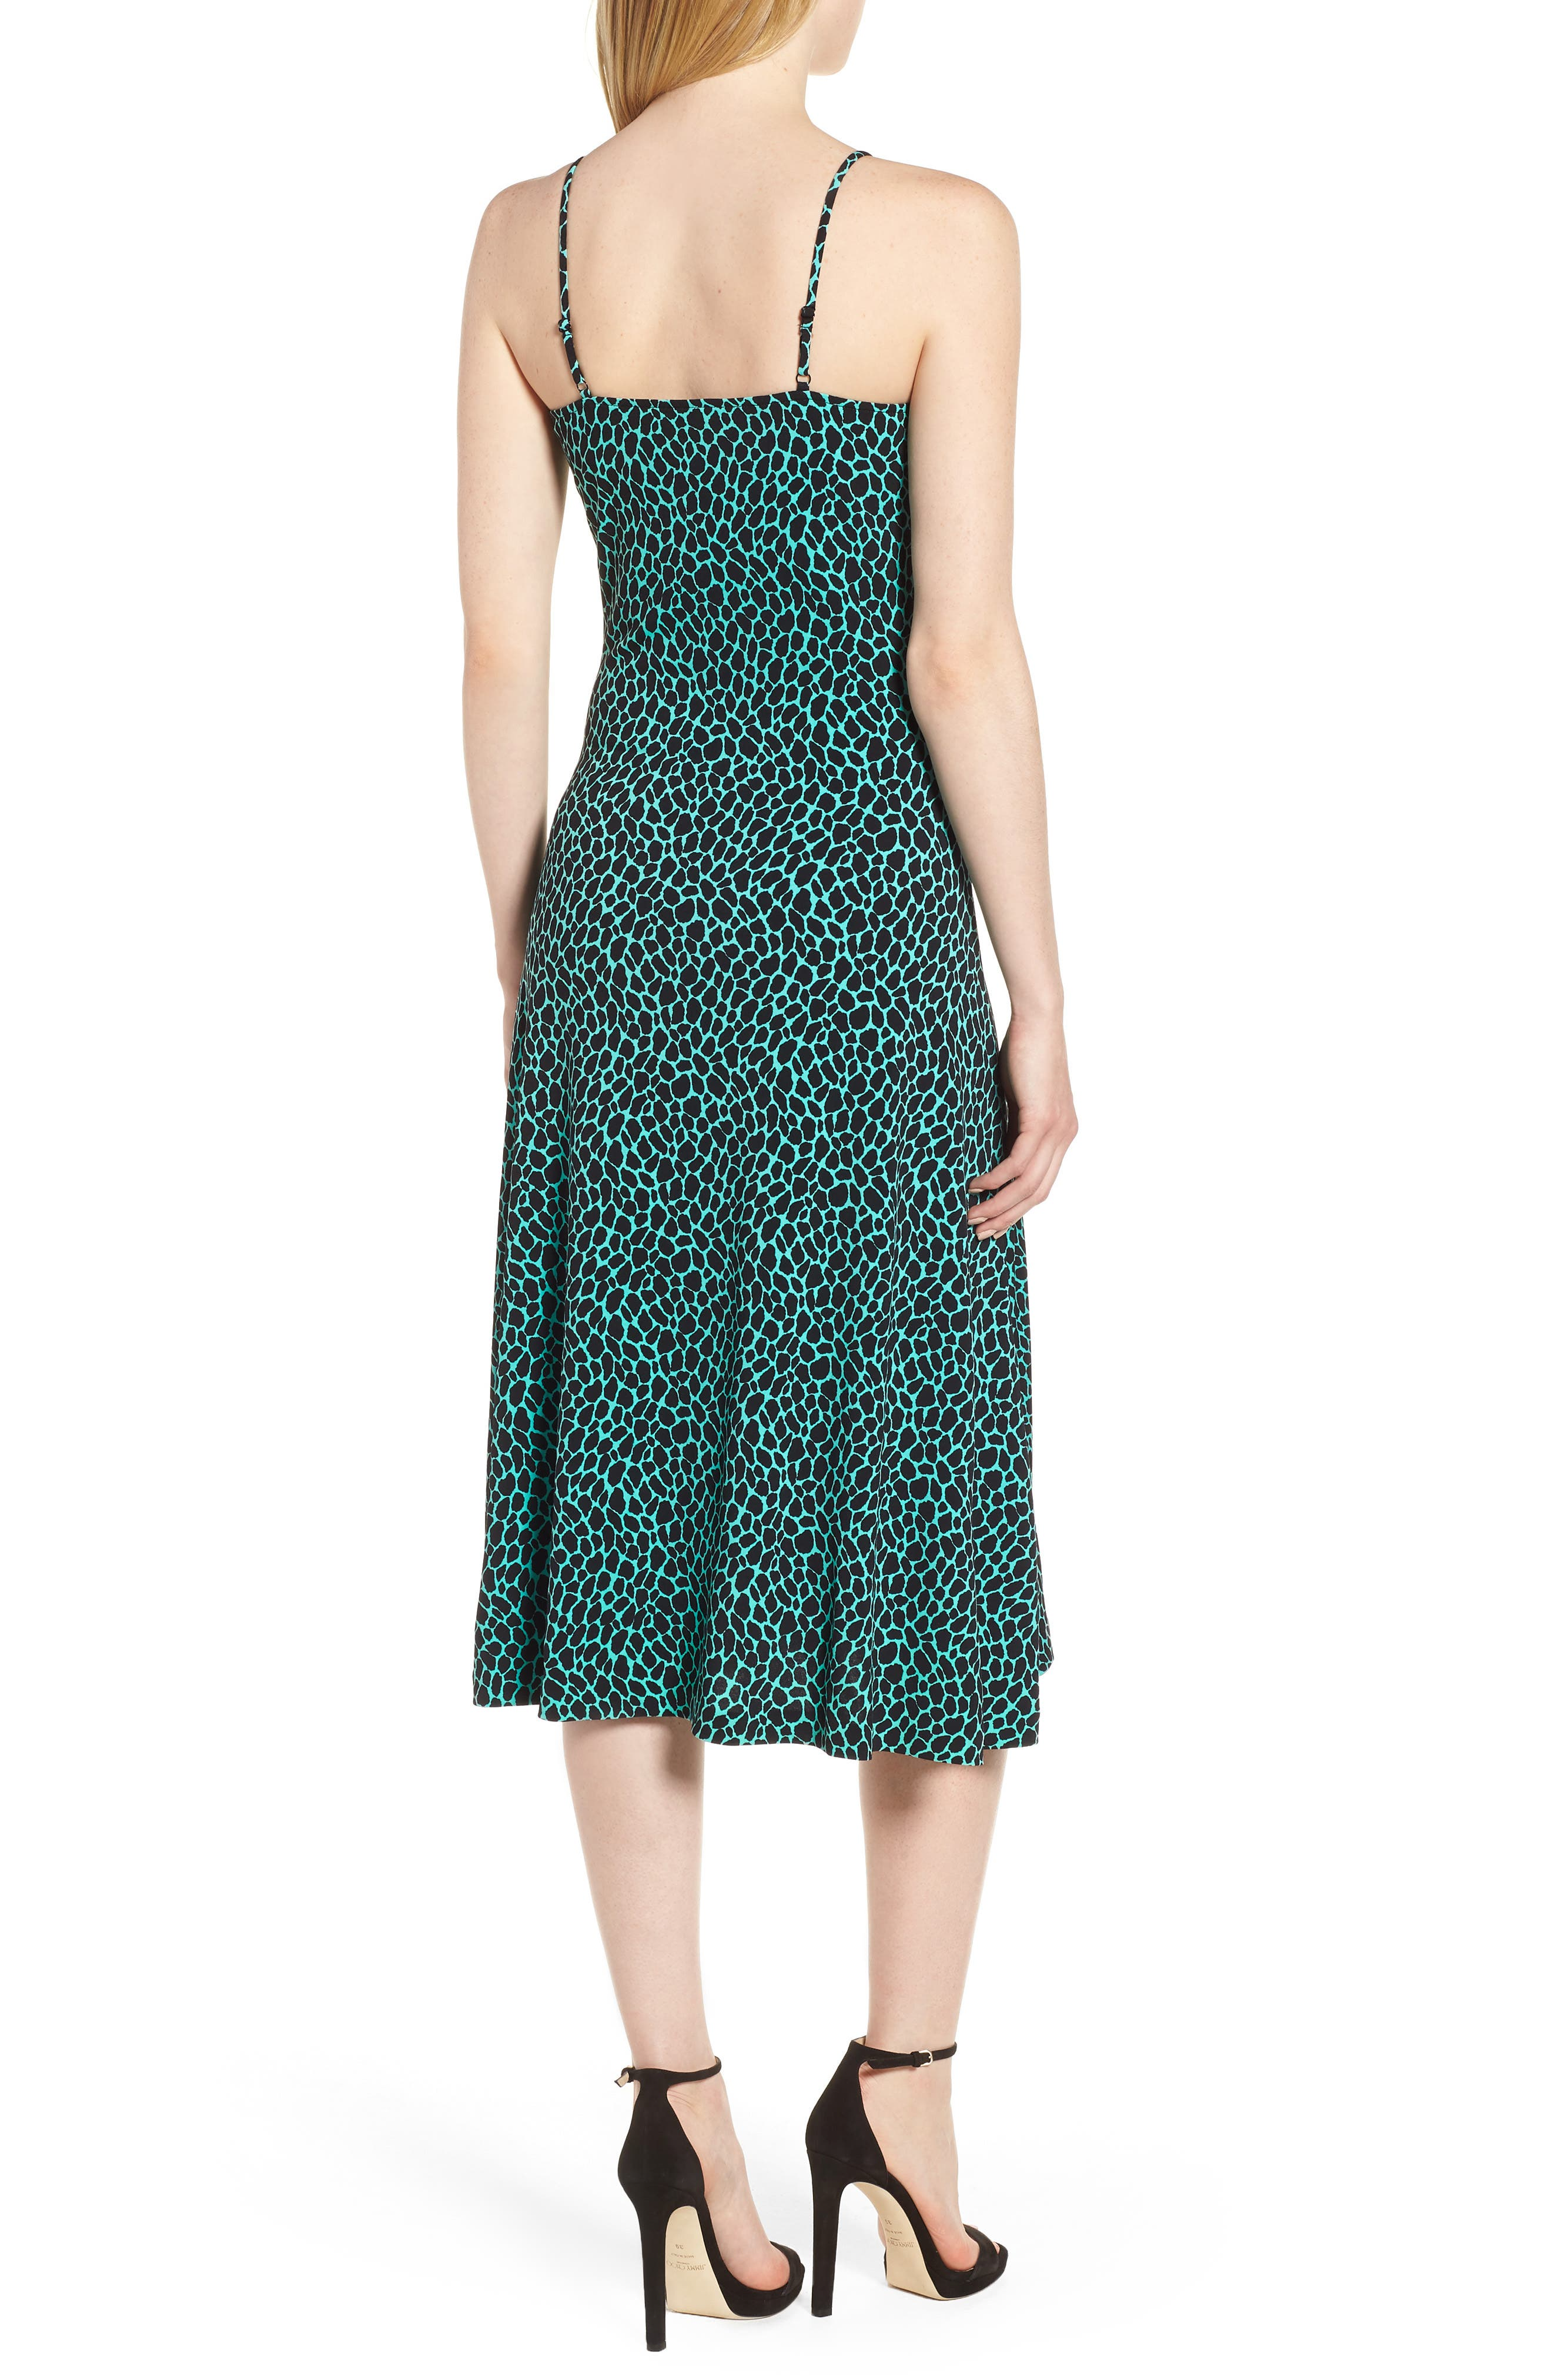 Graphic Leopard Tank Midi Dress,                             Alternate thumbnail 2, color,                             300